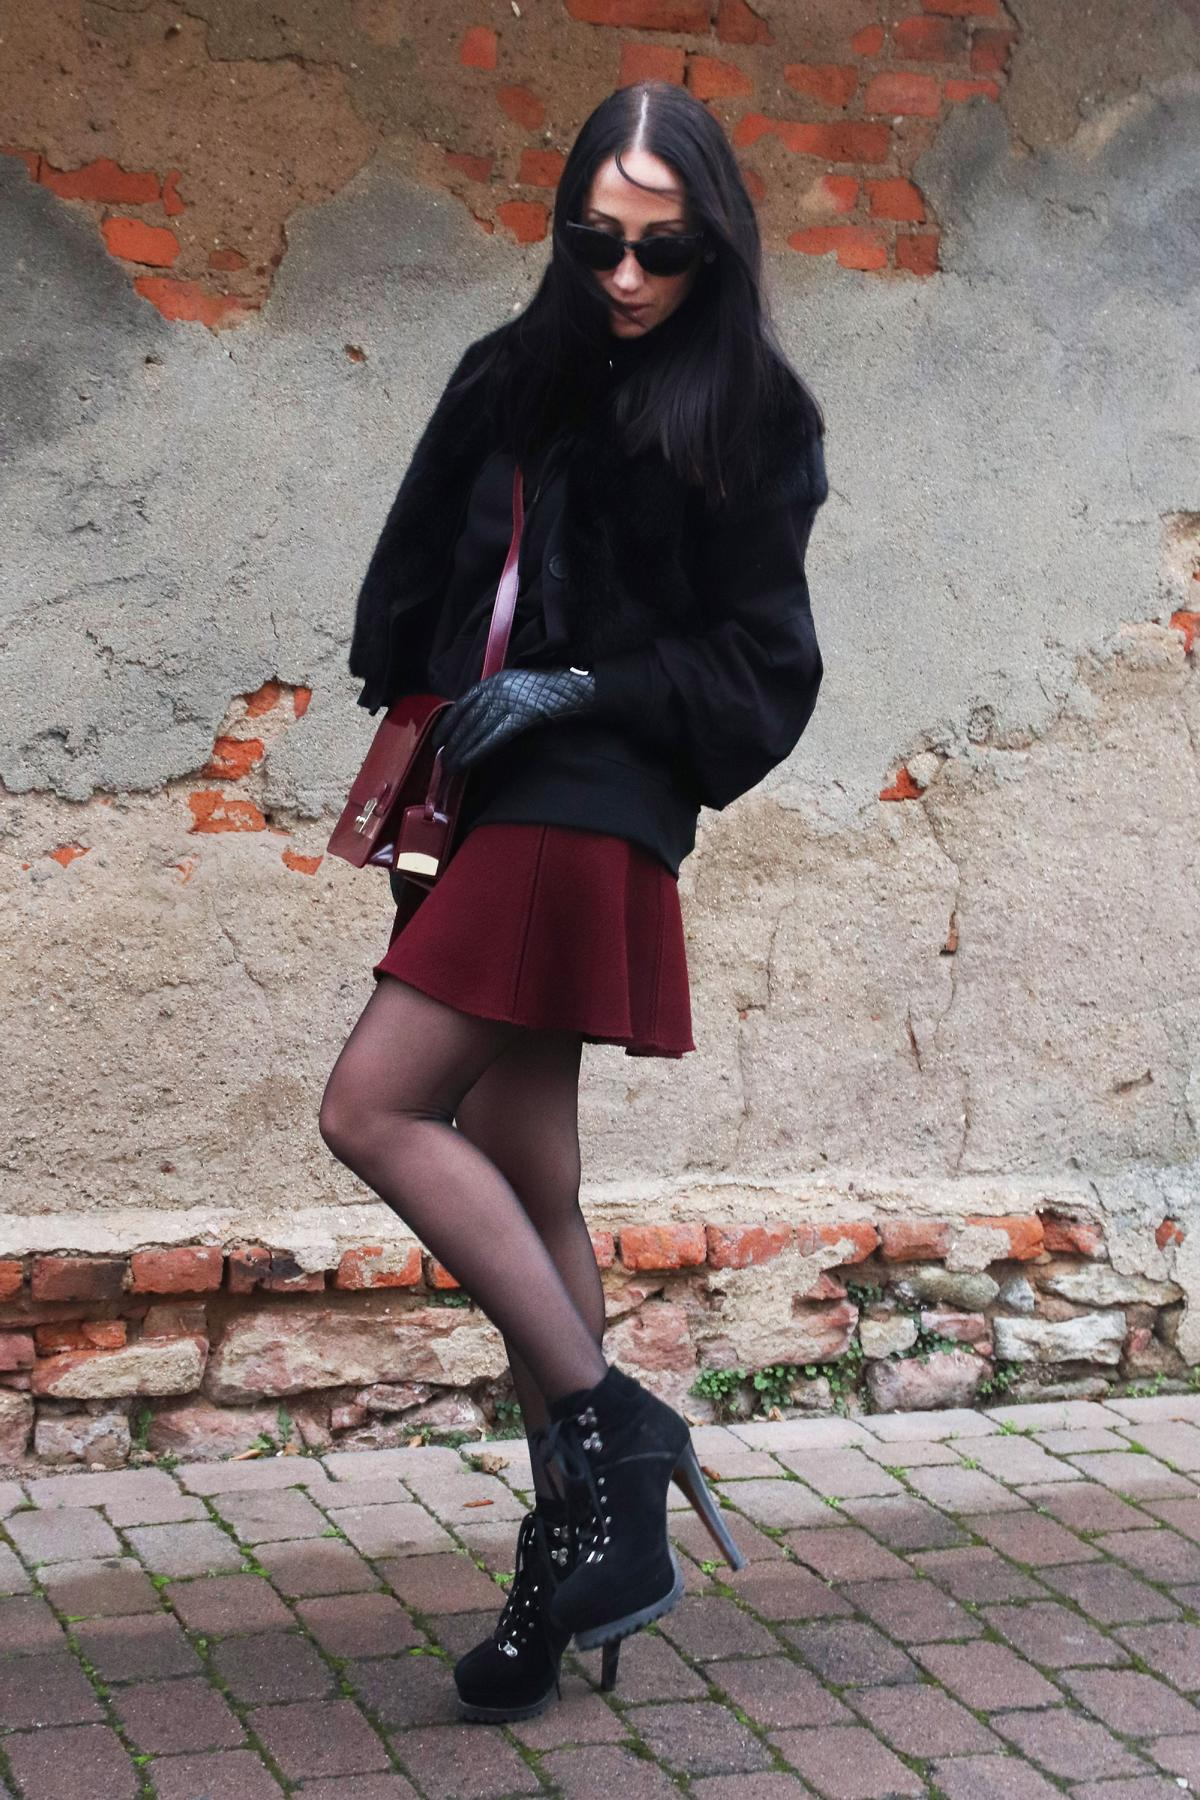 Edle Farbkombi in Bordeaux und Schwarz